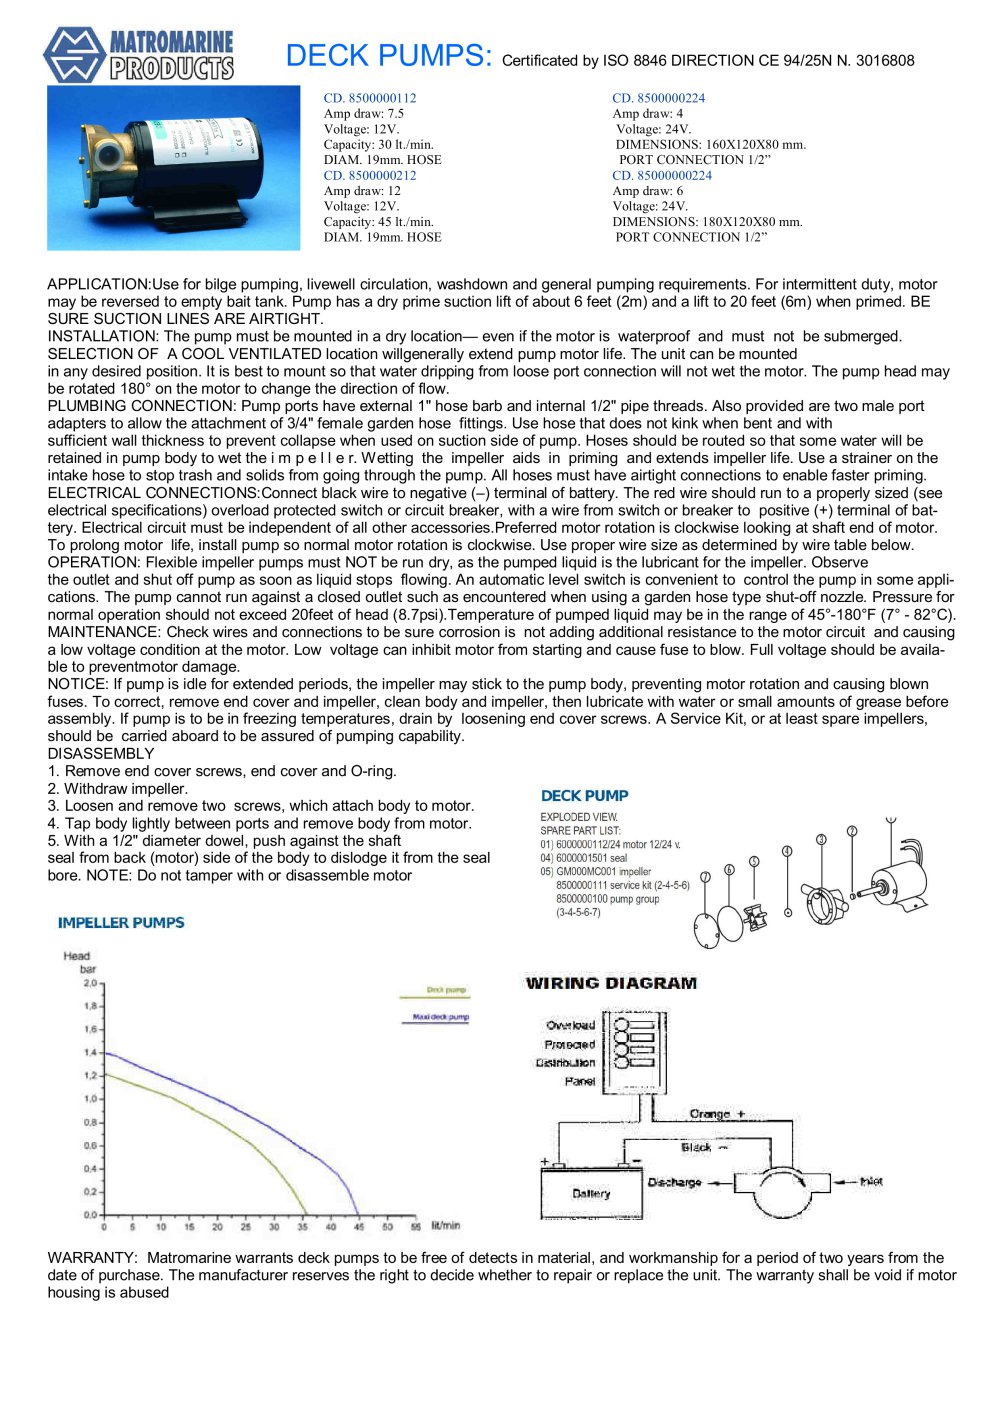 Deck Pump Matromarine Products Pdf Catalogues Documentation 24v Spotlight Wiring Diagram 1 2 Pages